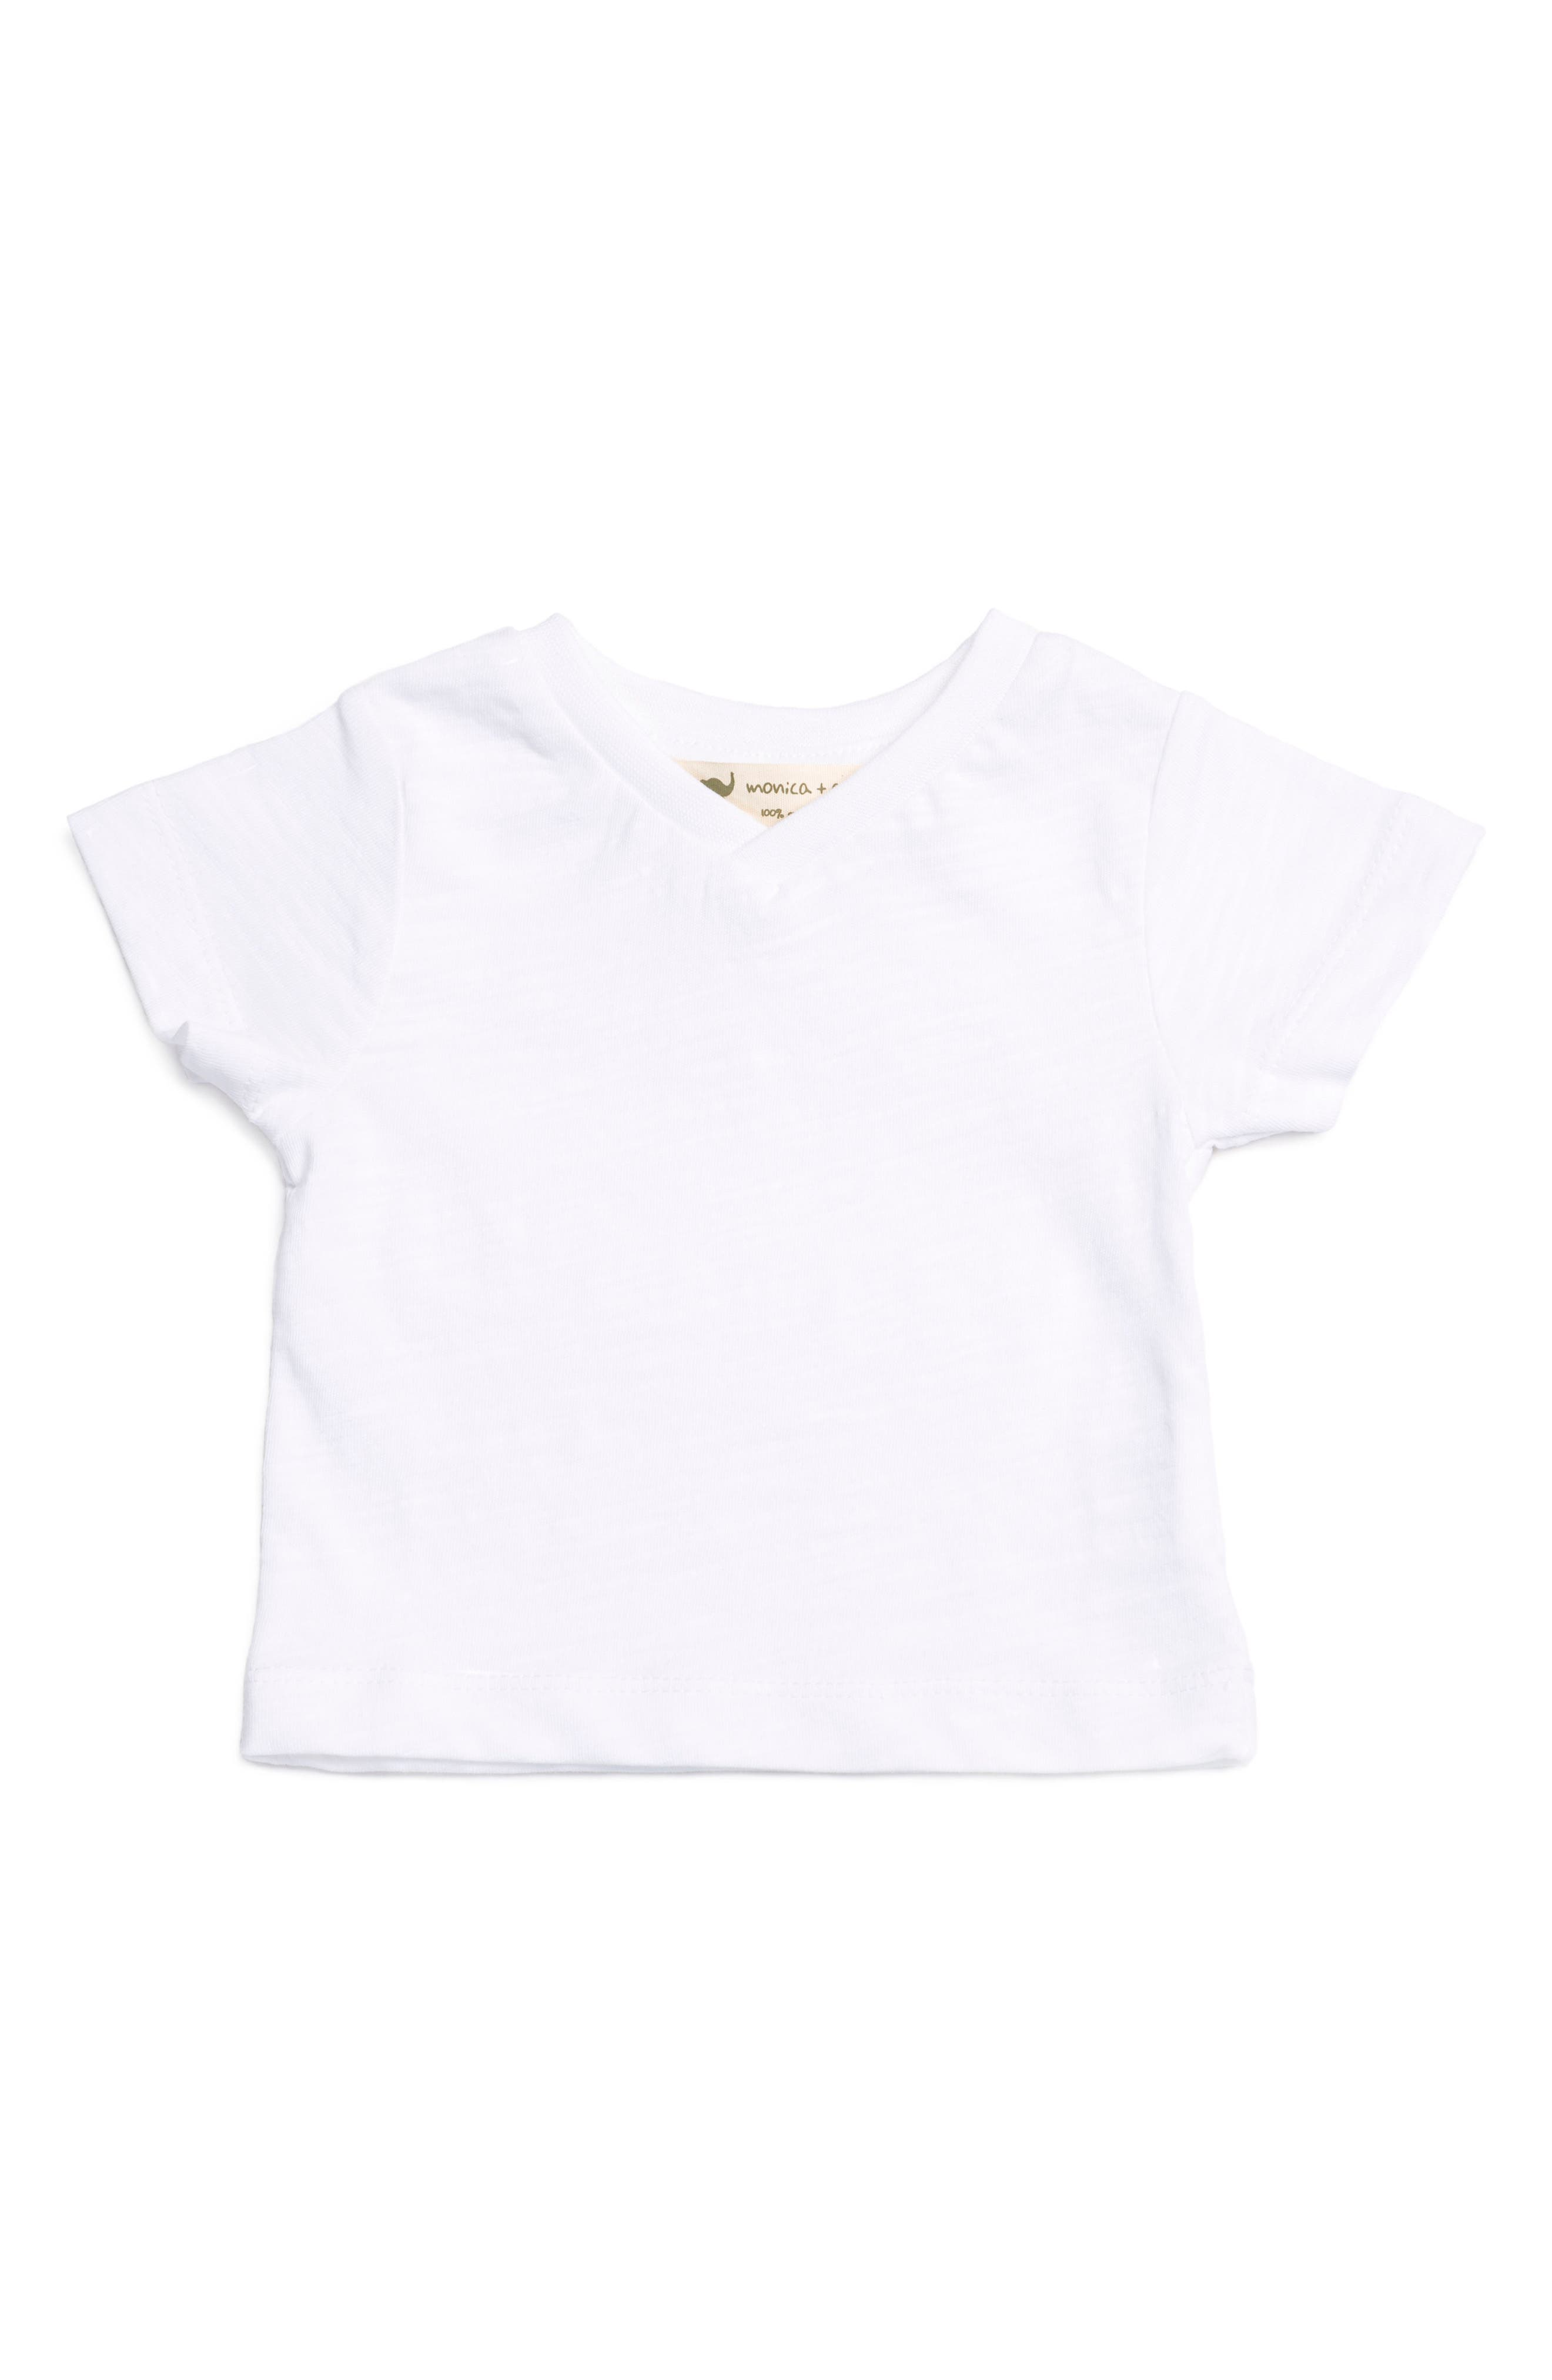 Main Image - Monica + Andy Classic V-Neck T-Shirt (Toddler Boys)